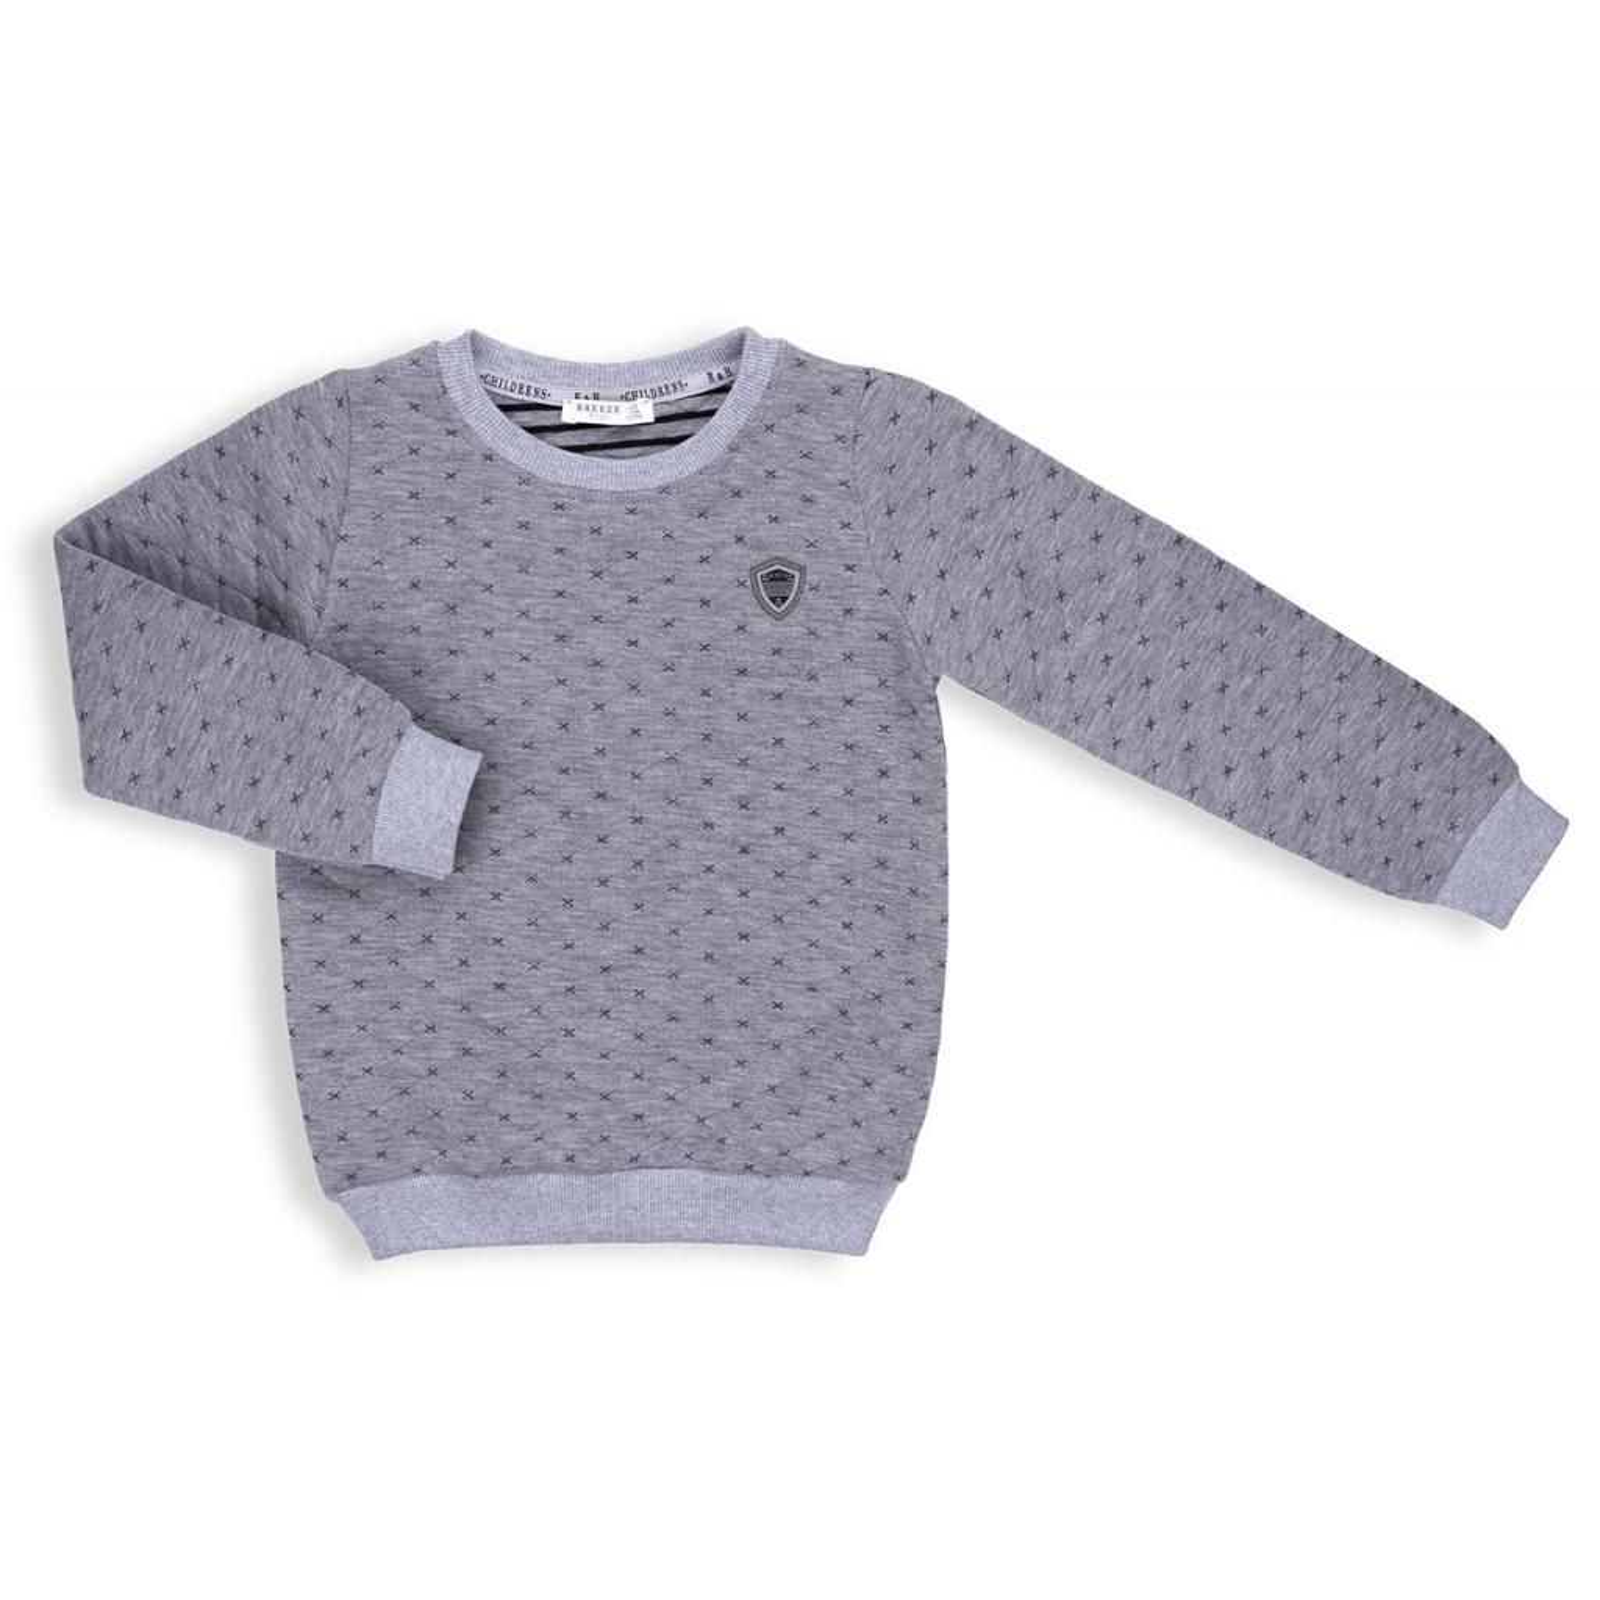 Кофта E&H трикотажная (11026-152B-gray)